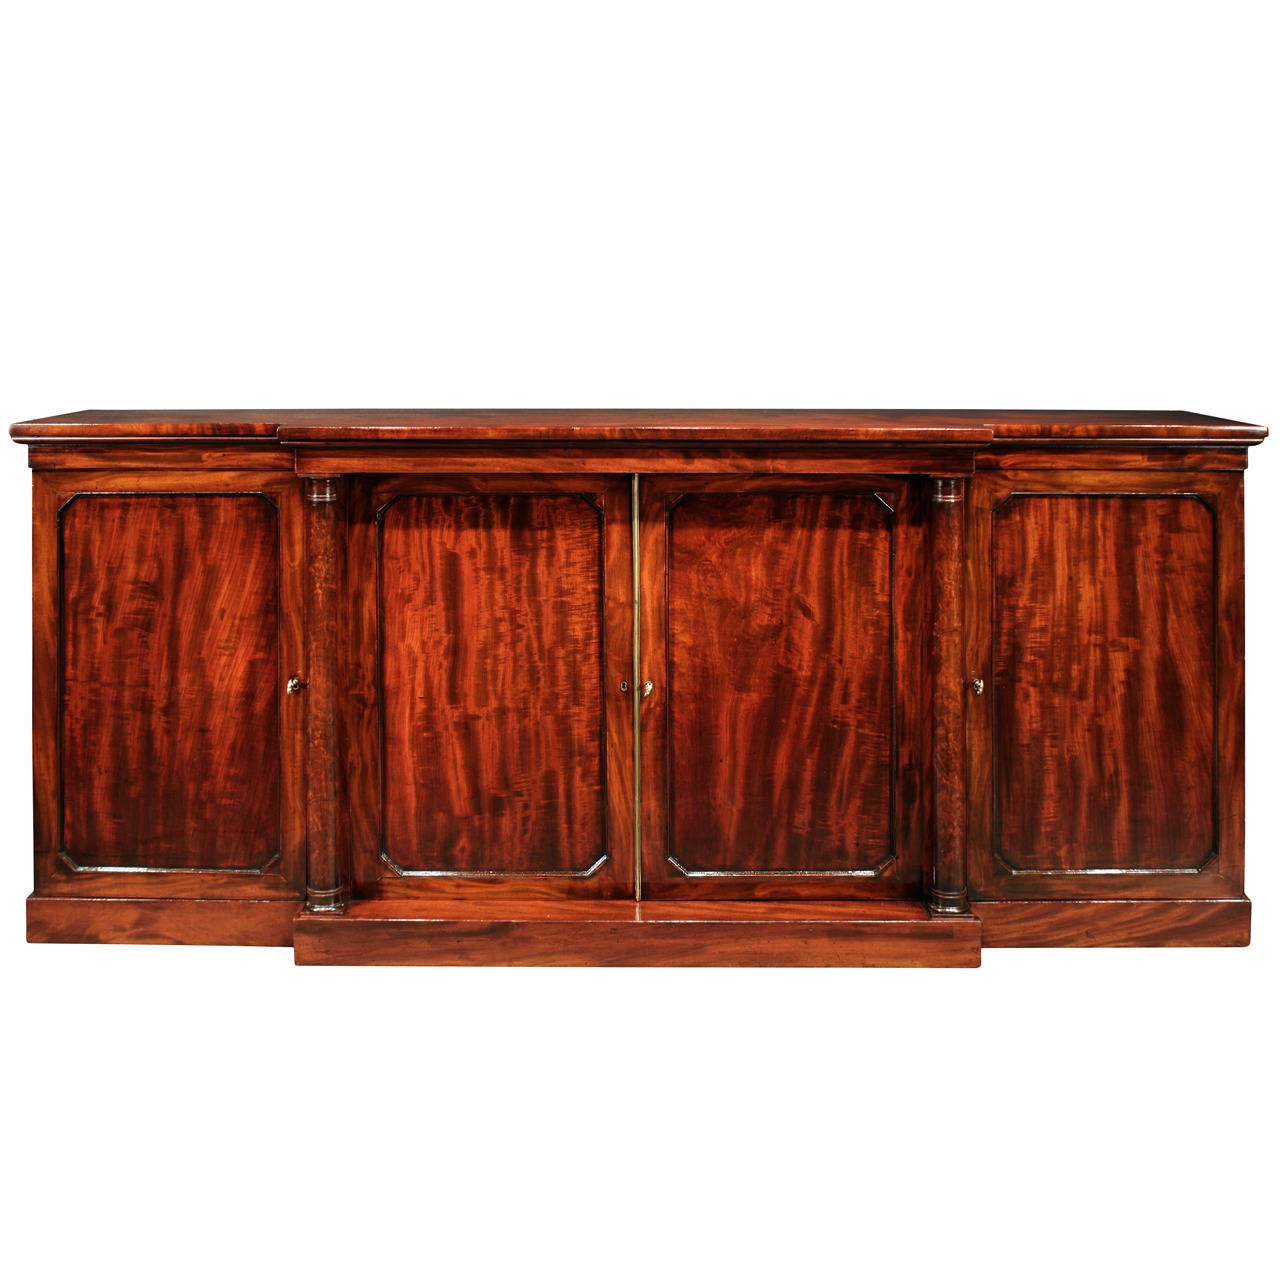 English Early 19th Century Regency Style Flamed Mahogany Sideboard